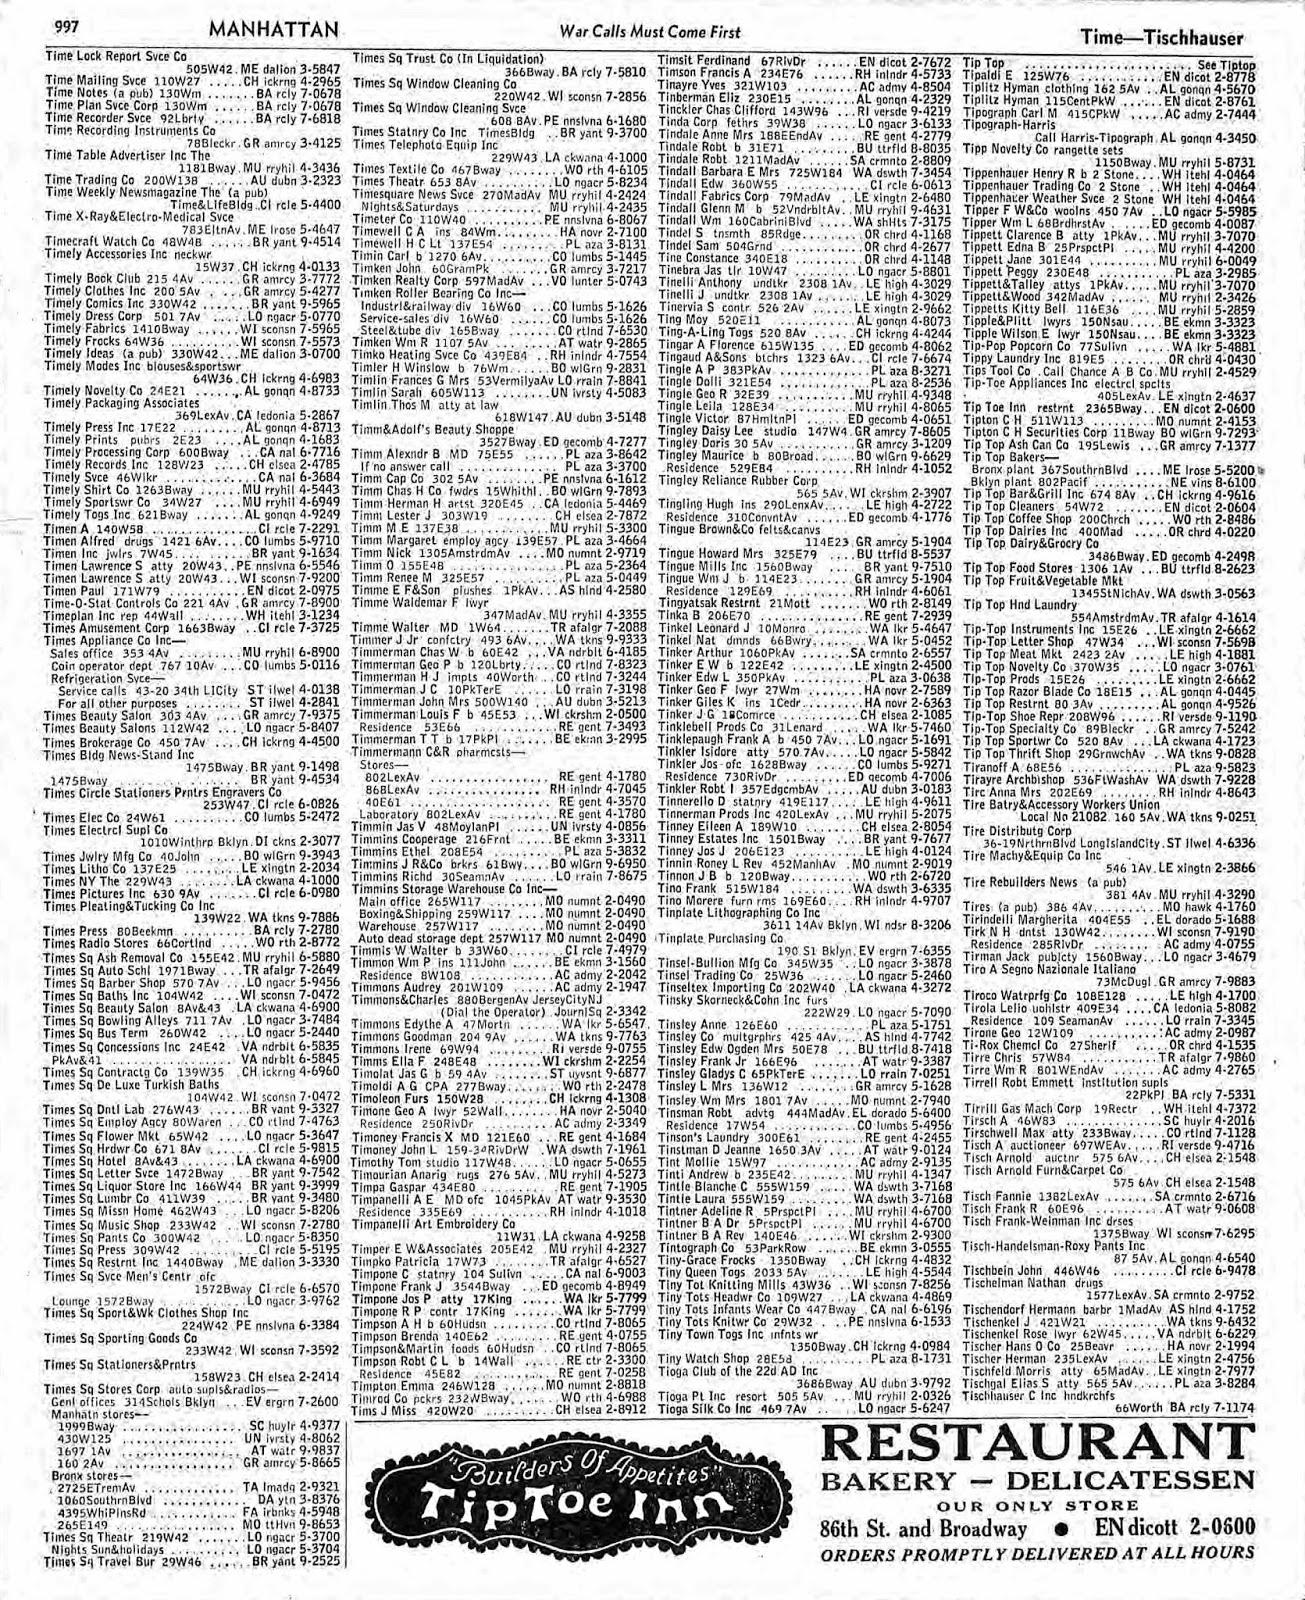 December 1942, New York Telephone CompanyPage 390: Goodman Martin Pubr 330 W  42u2026u2026.BR Yant 9 5965 (McGraw Hill Address)